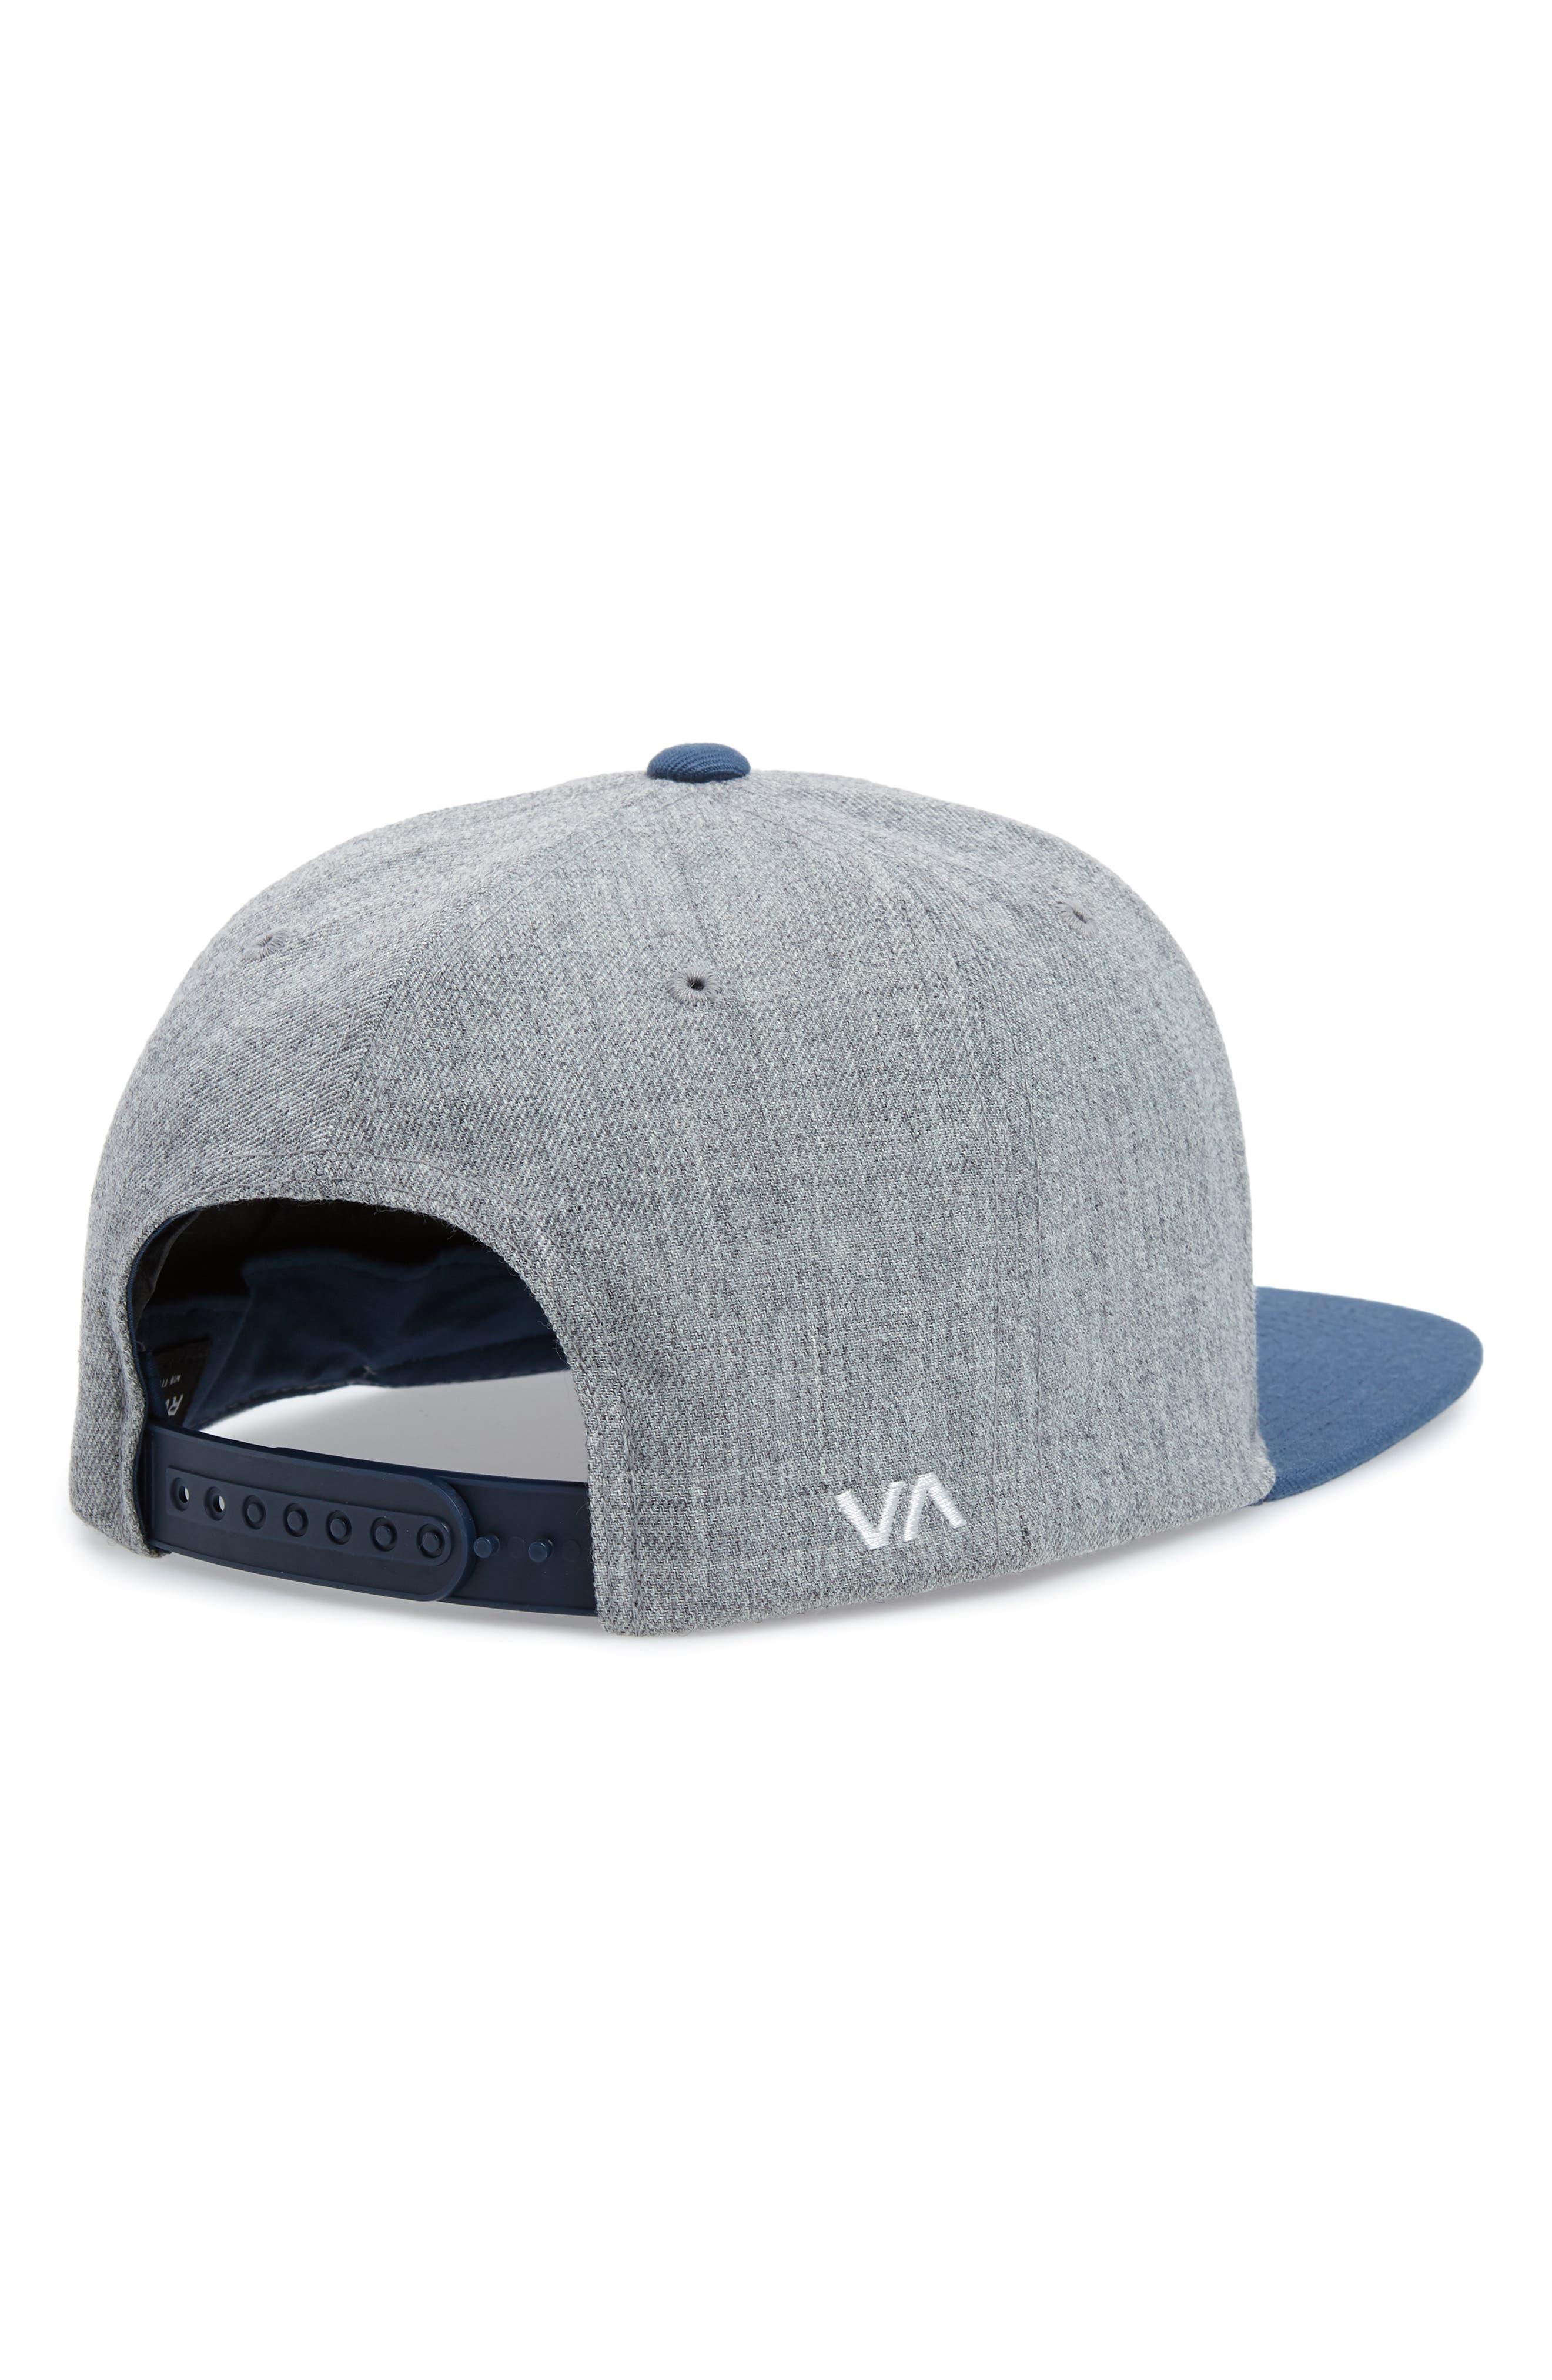 RVCA, Twill Snapback Baseball Cap, Alternate thumbnail 2, color, GREY BLUE